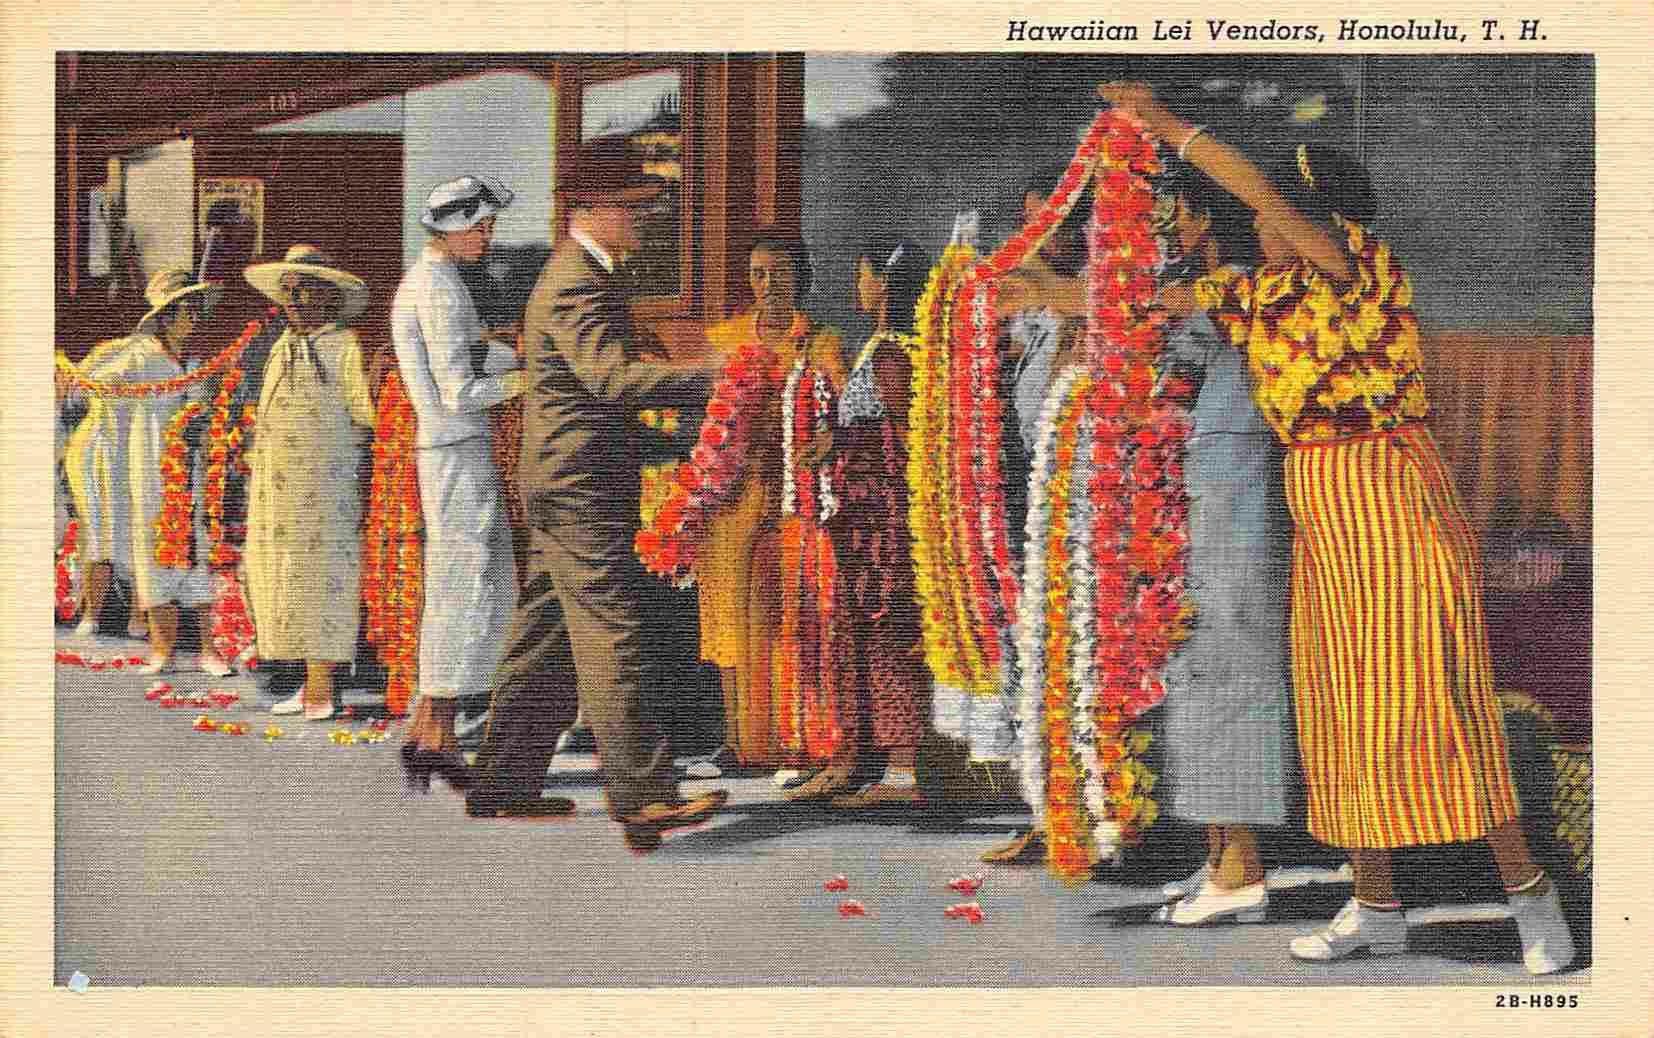 Hawaiian Lei Sellers Greeting Visitors Hawaii 1940s linen postcard